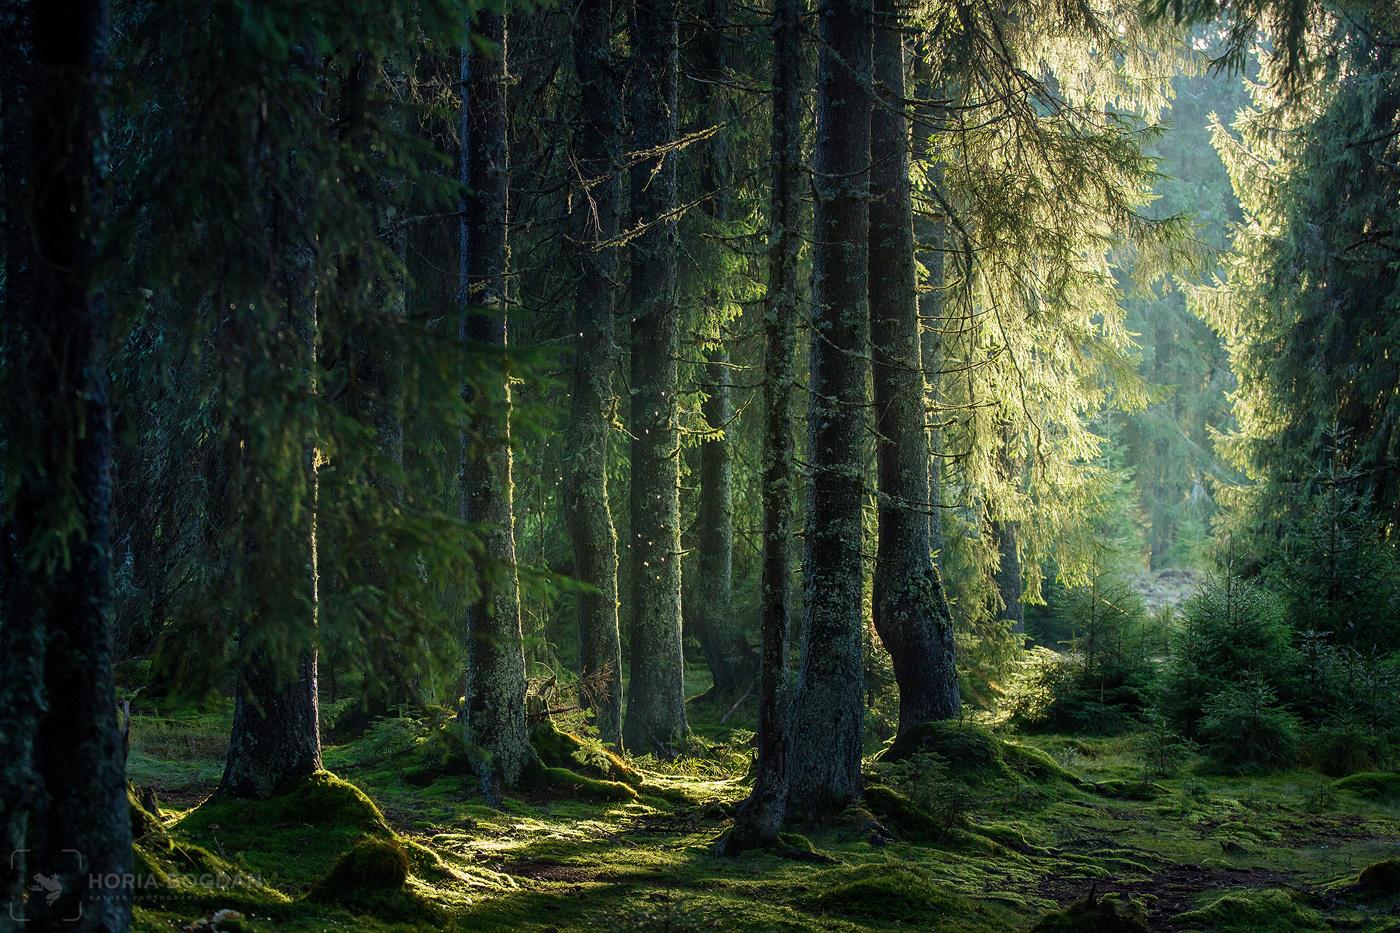 Fairy-tale woodland by Horia Bogdan